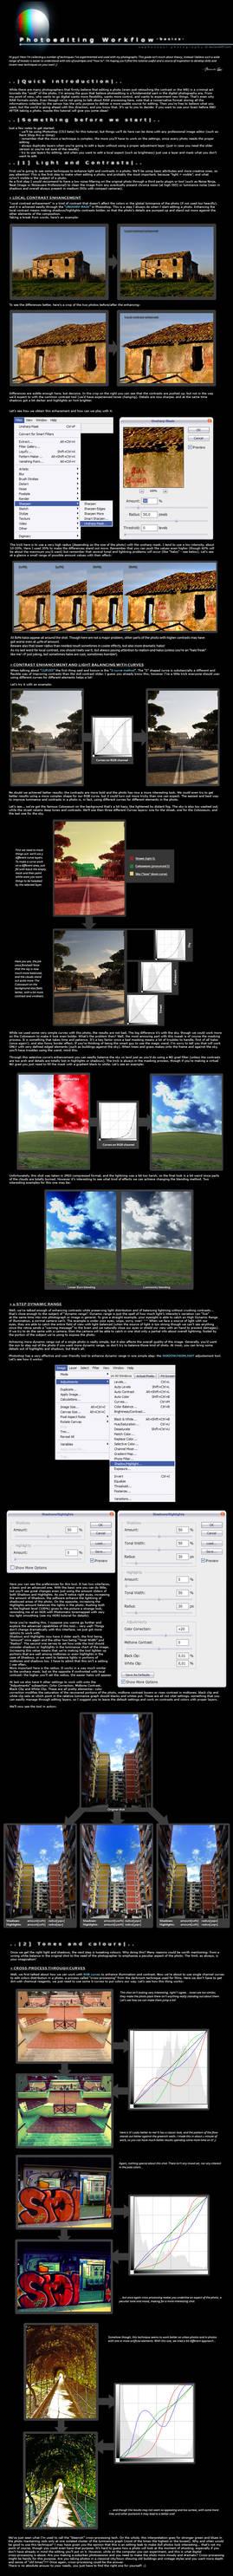 Photoediting Workflow basic